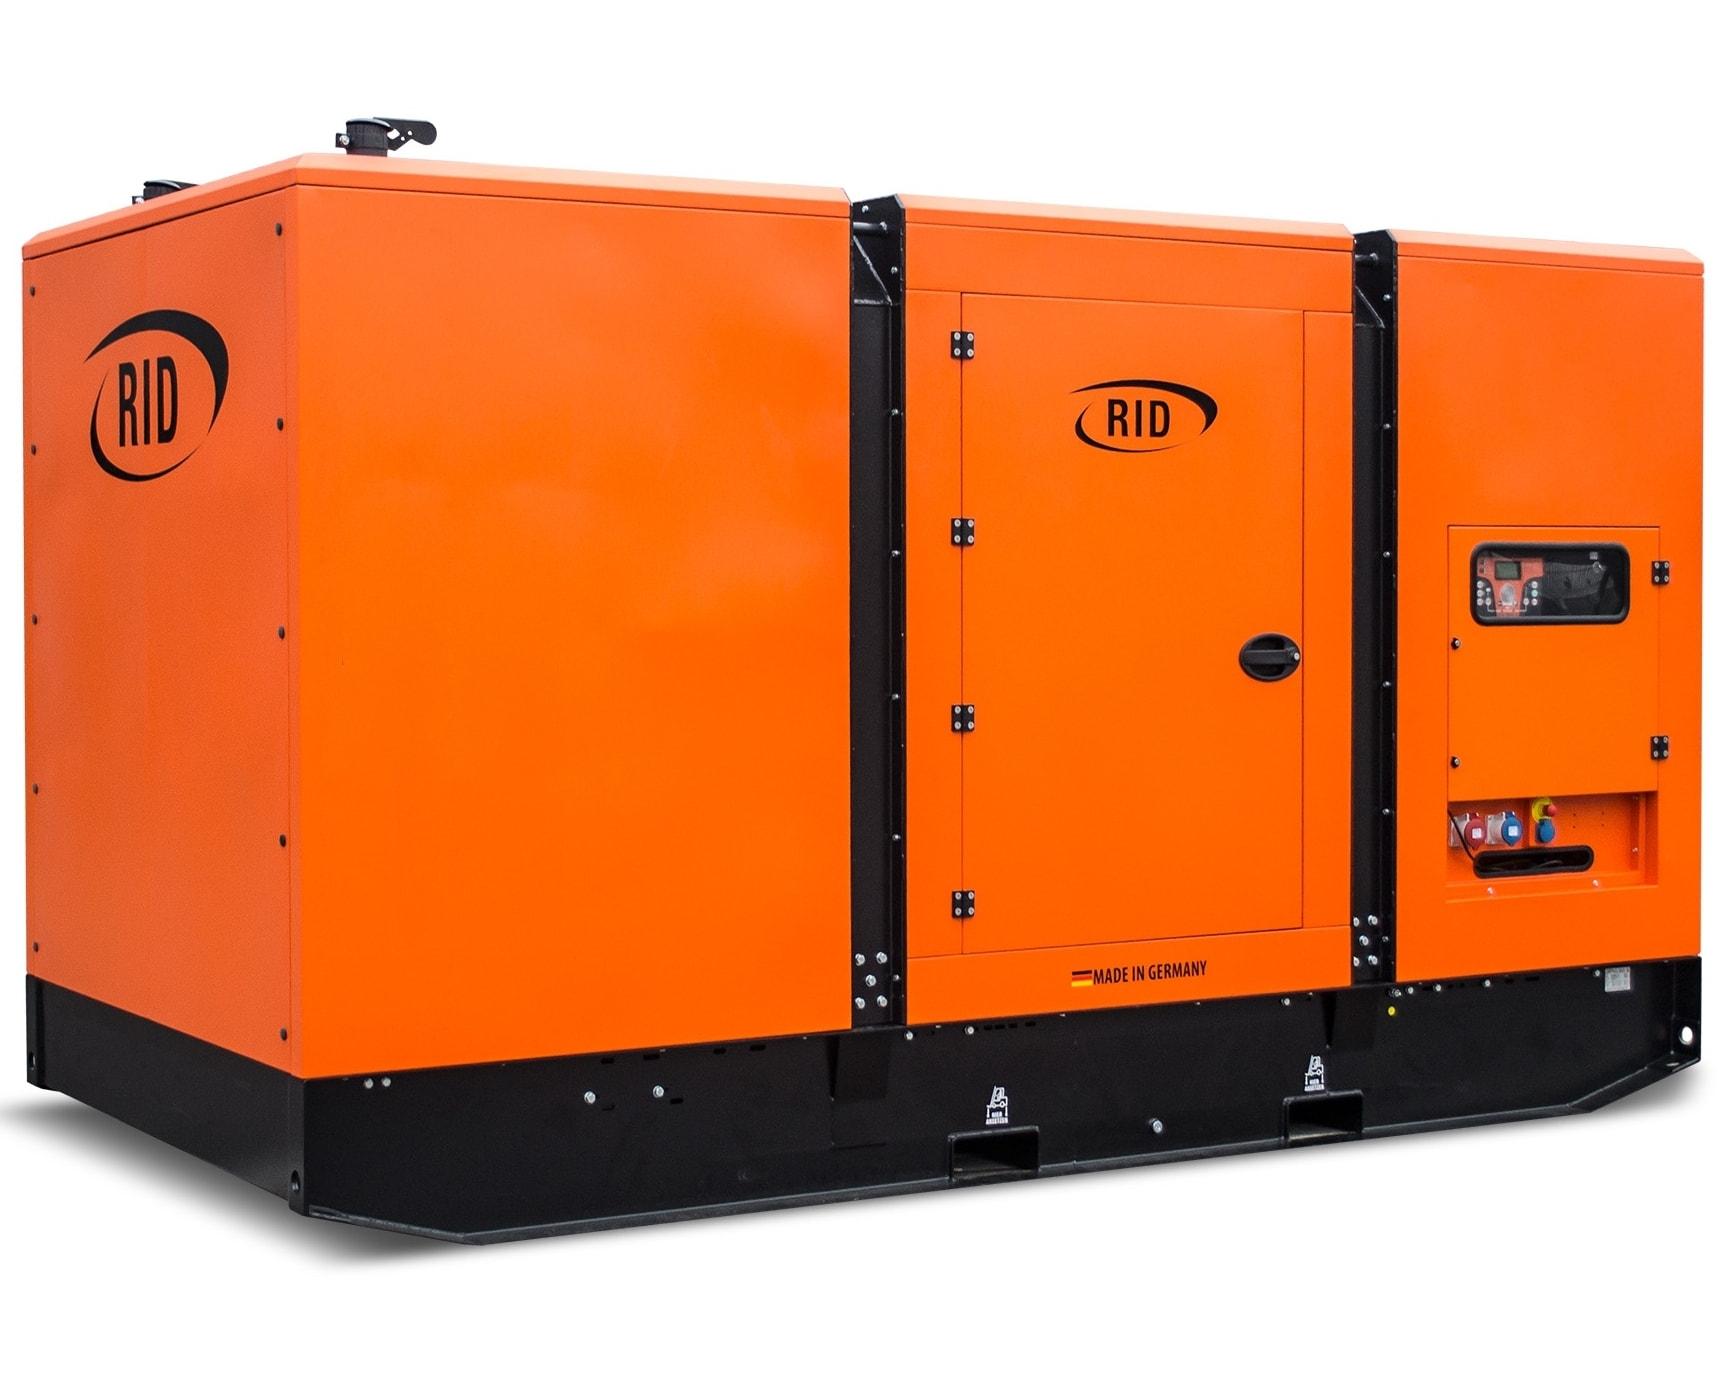 дизельная электростанция rid 400 c-series s